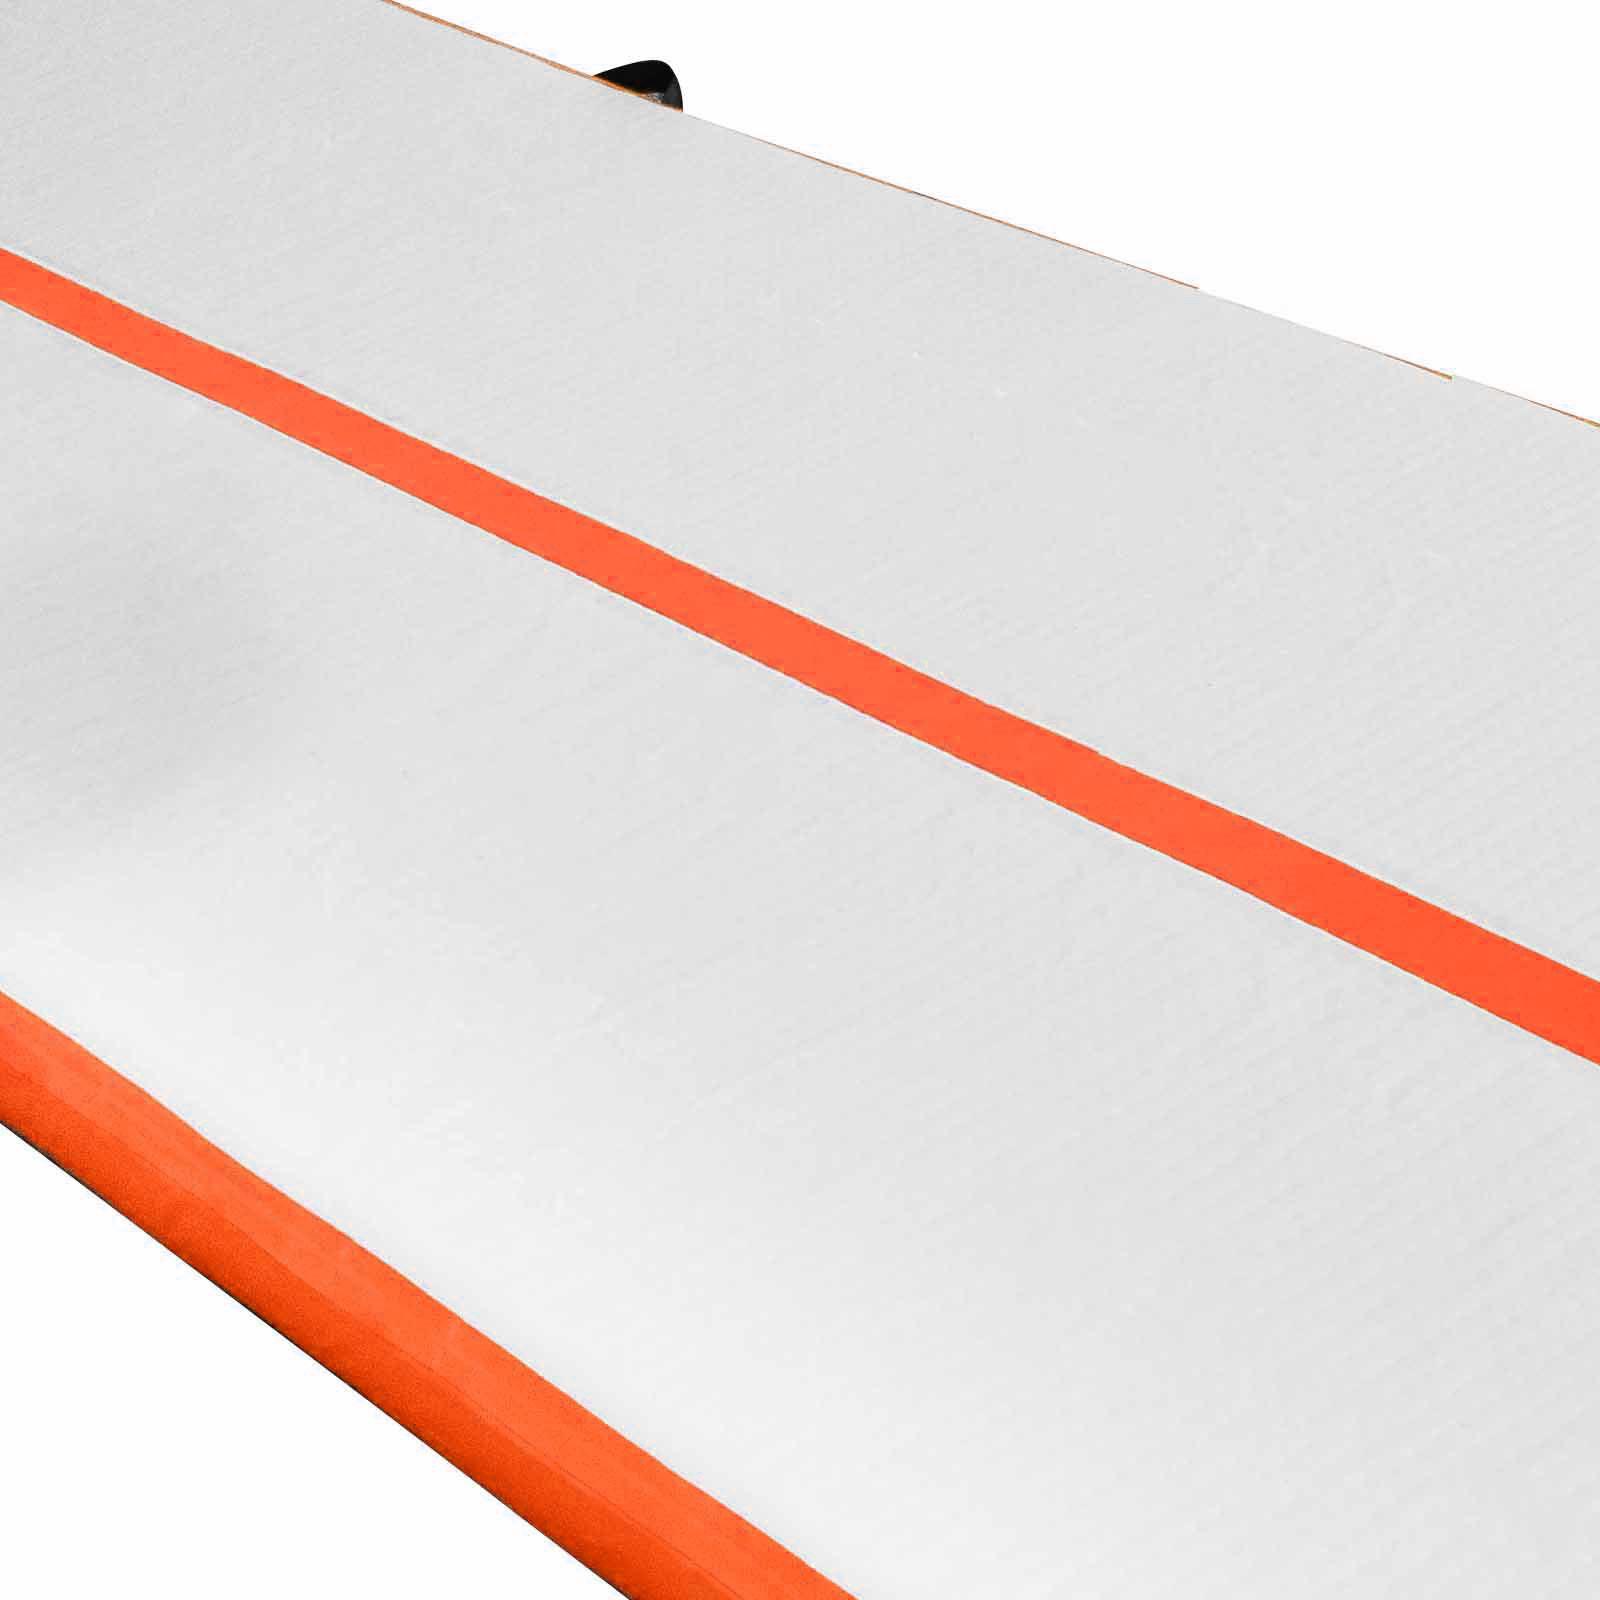 Air-Track-10x3FT-Trumbling-Airtrack-Gymnastics-Yoga-Floor-Mat-Training-Pad-Home thumbnail 31